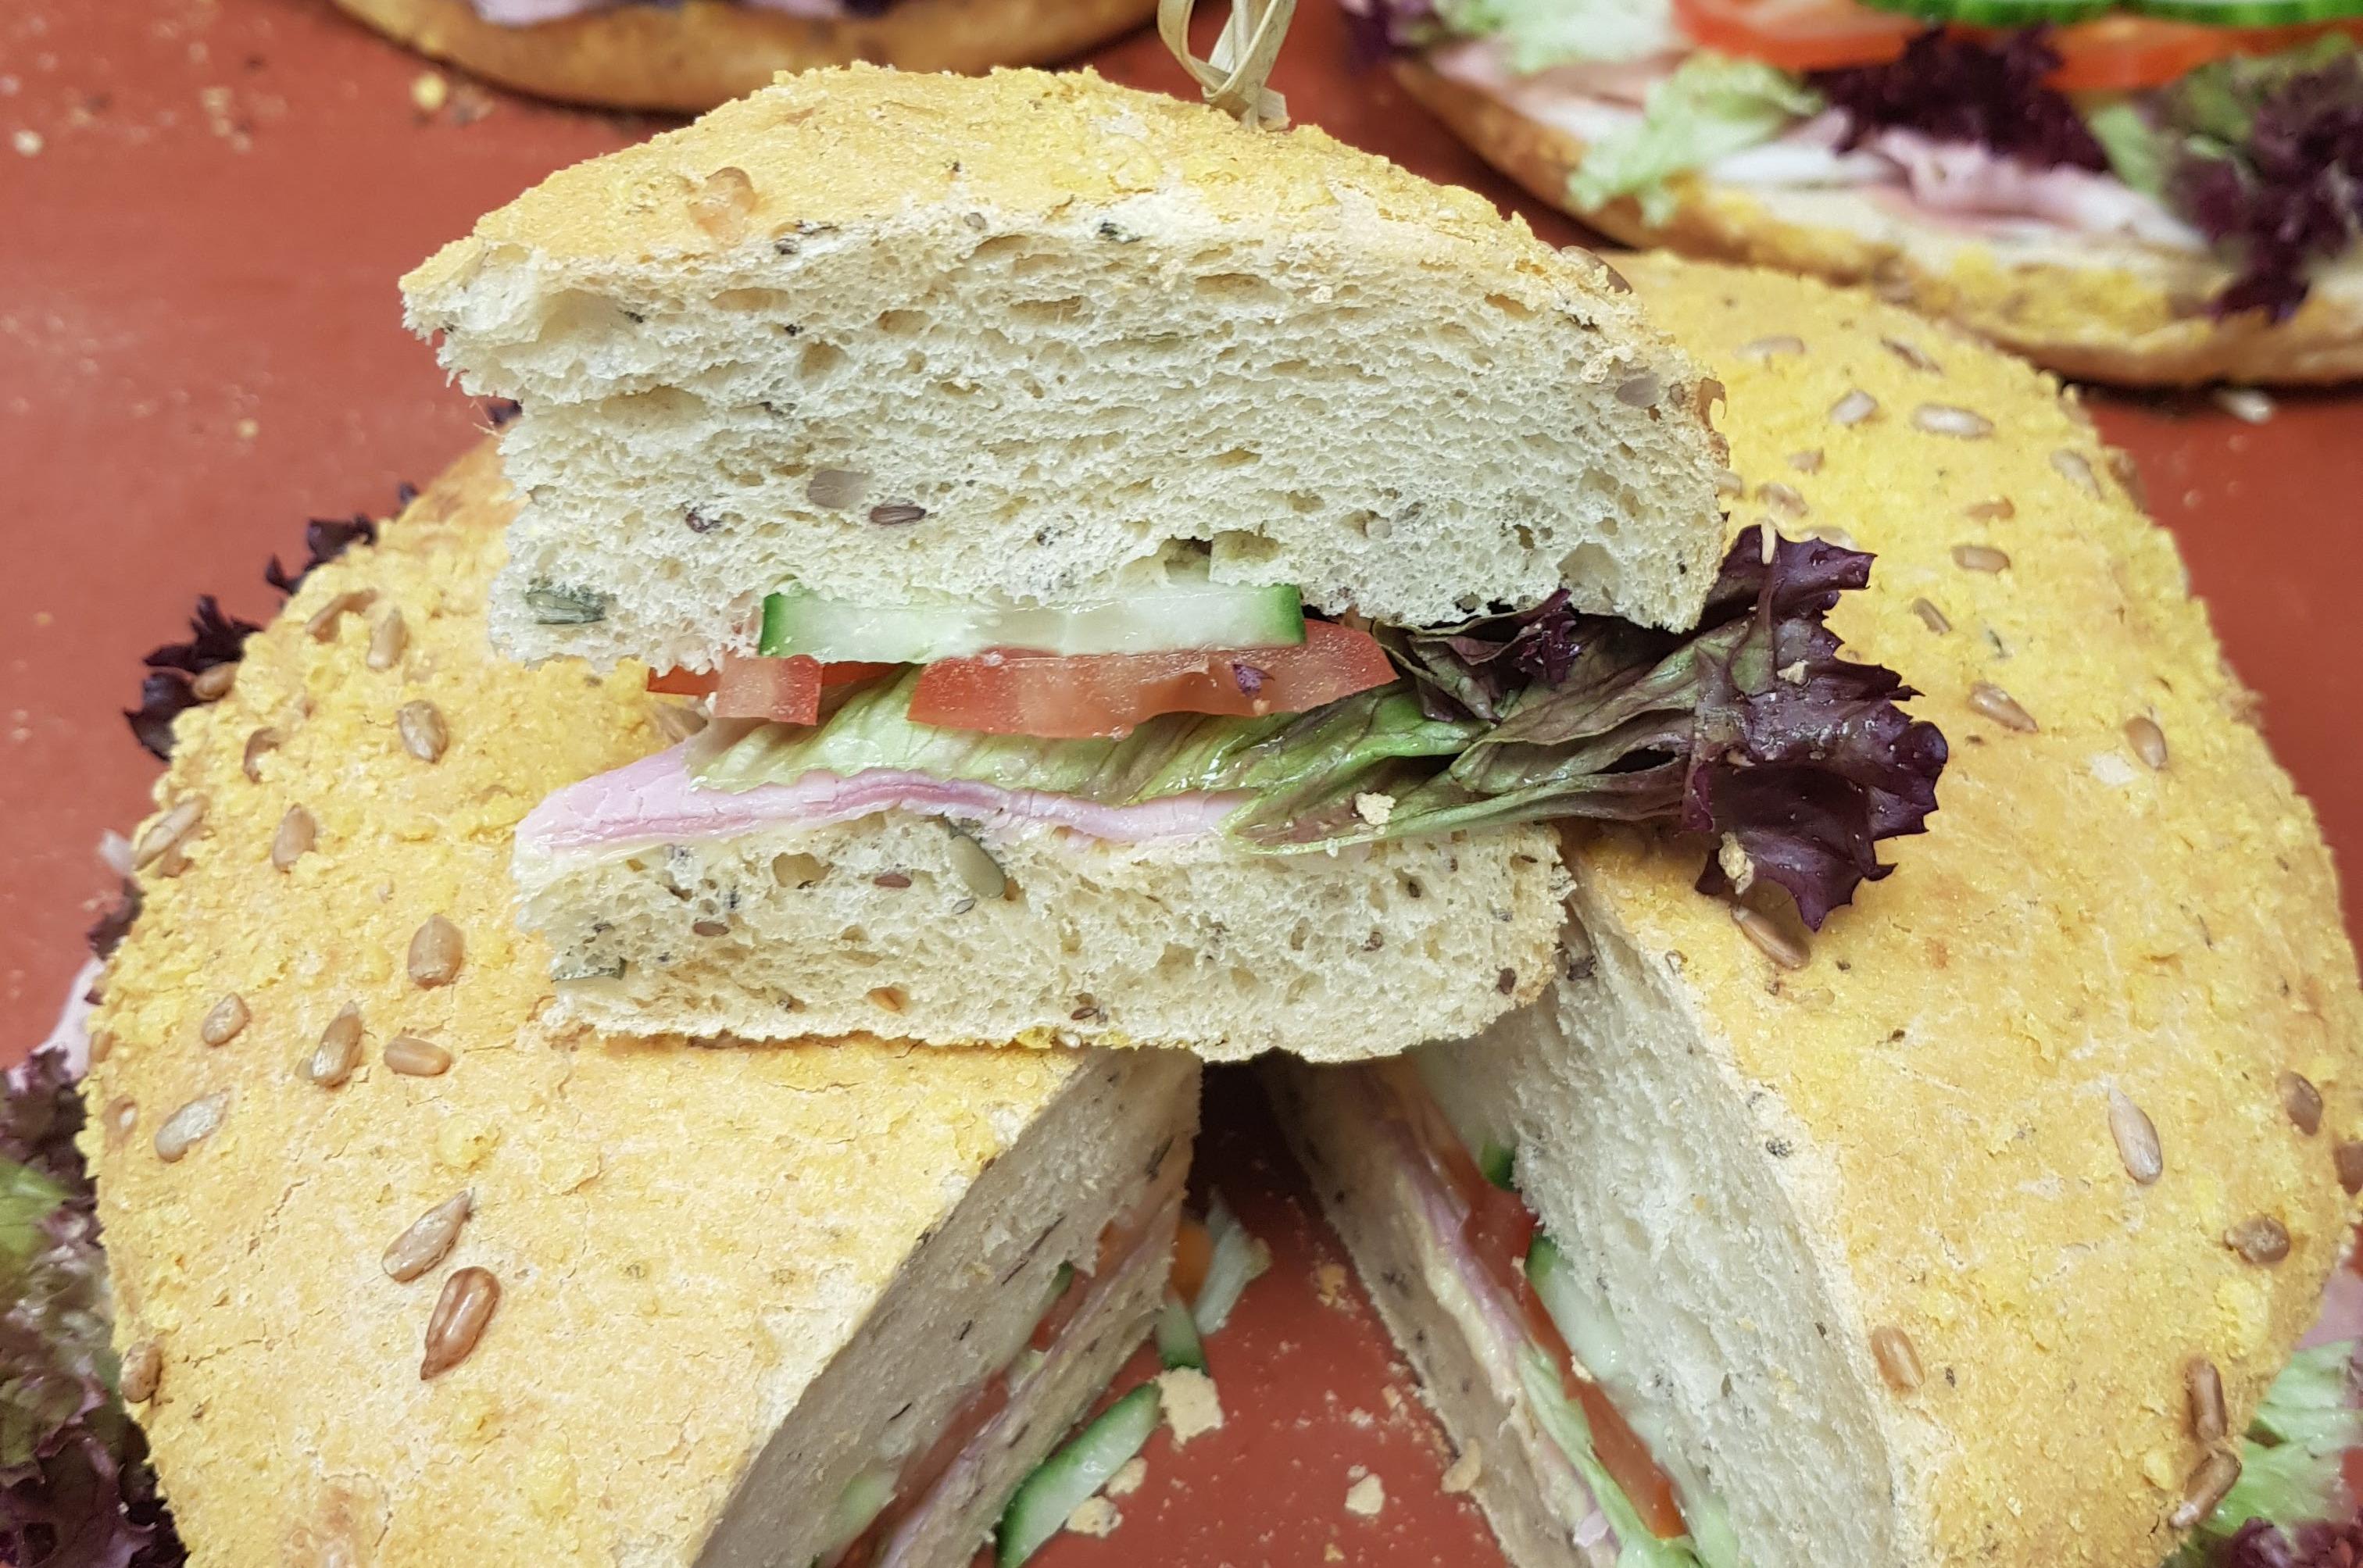 Luikse brood vleeswaren, komkommer,sla en tomaat